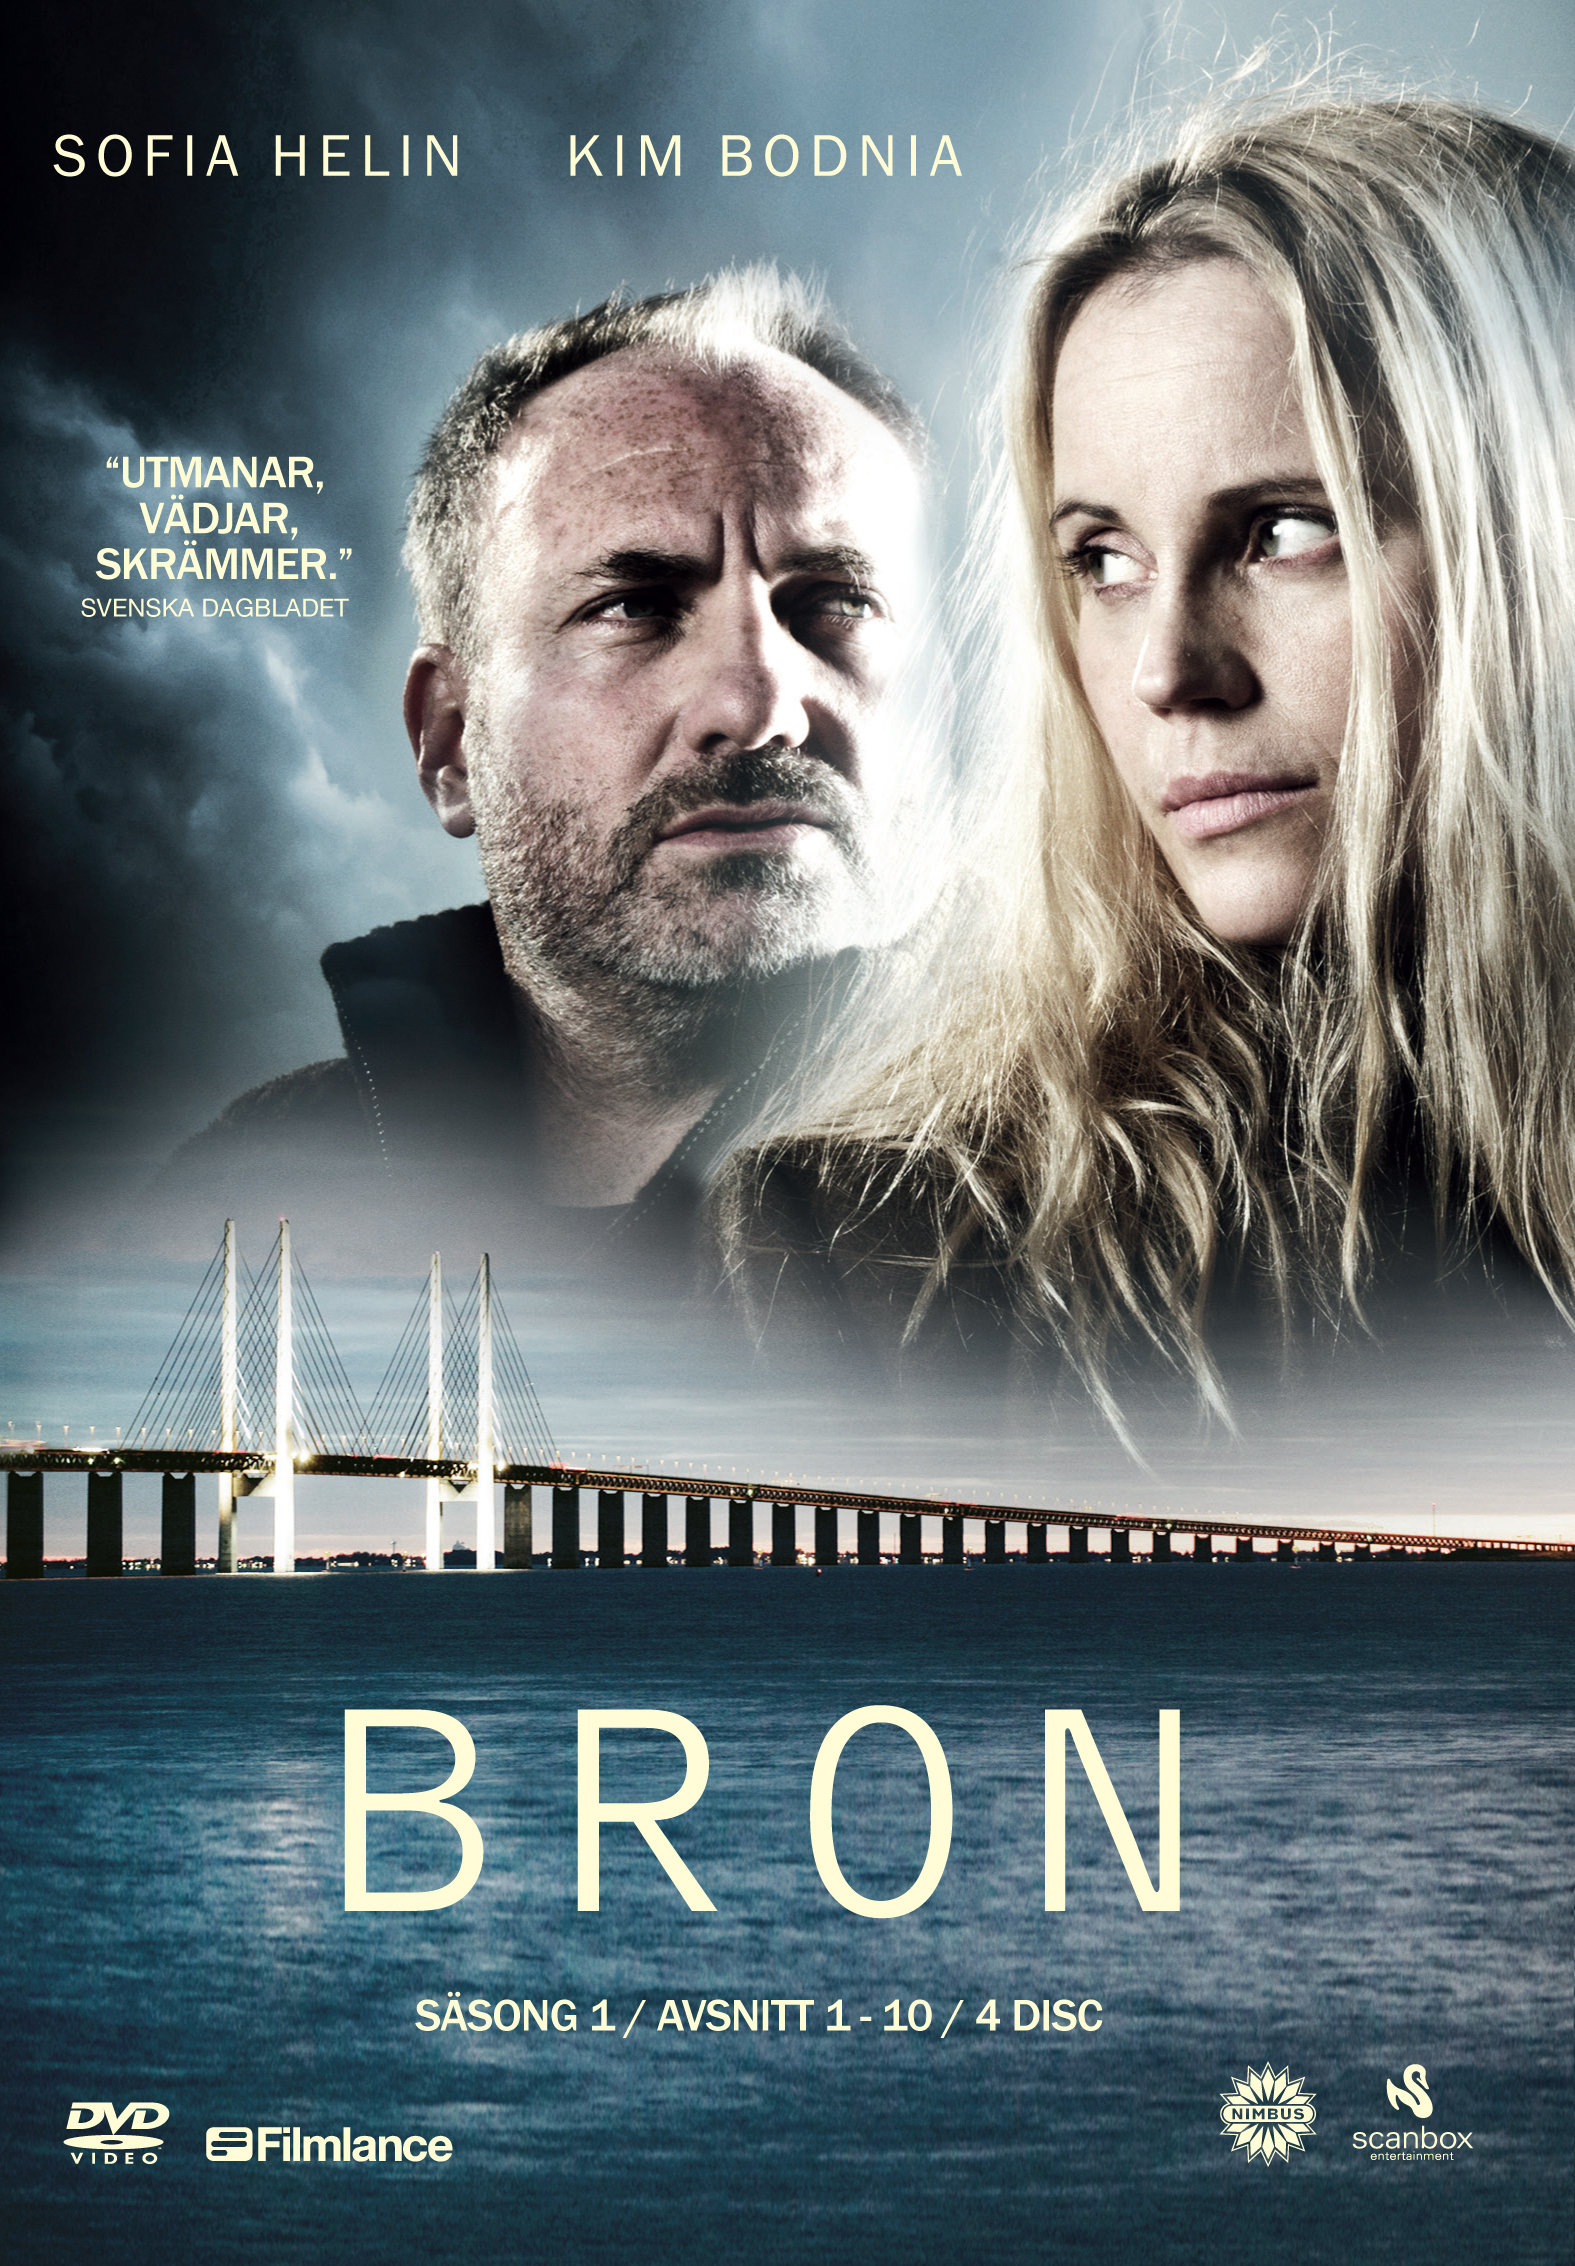 Kim Bodnia and Sofia Helin in Bron/Broen (2011)